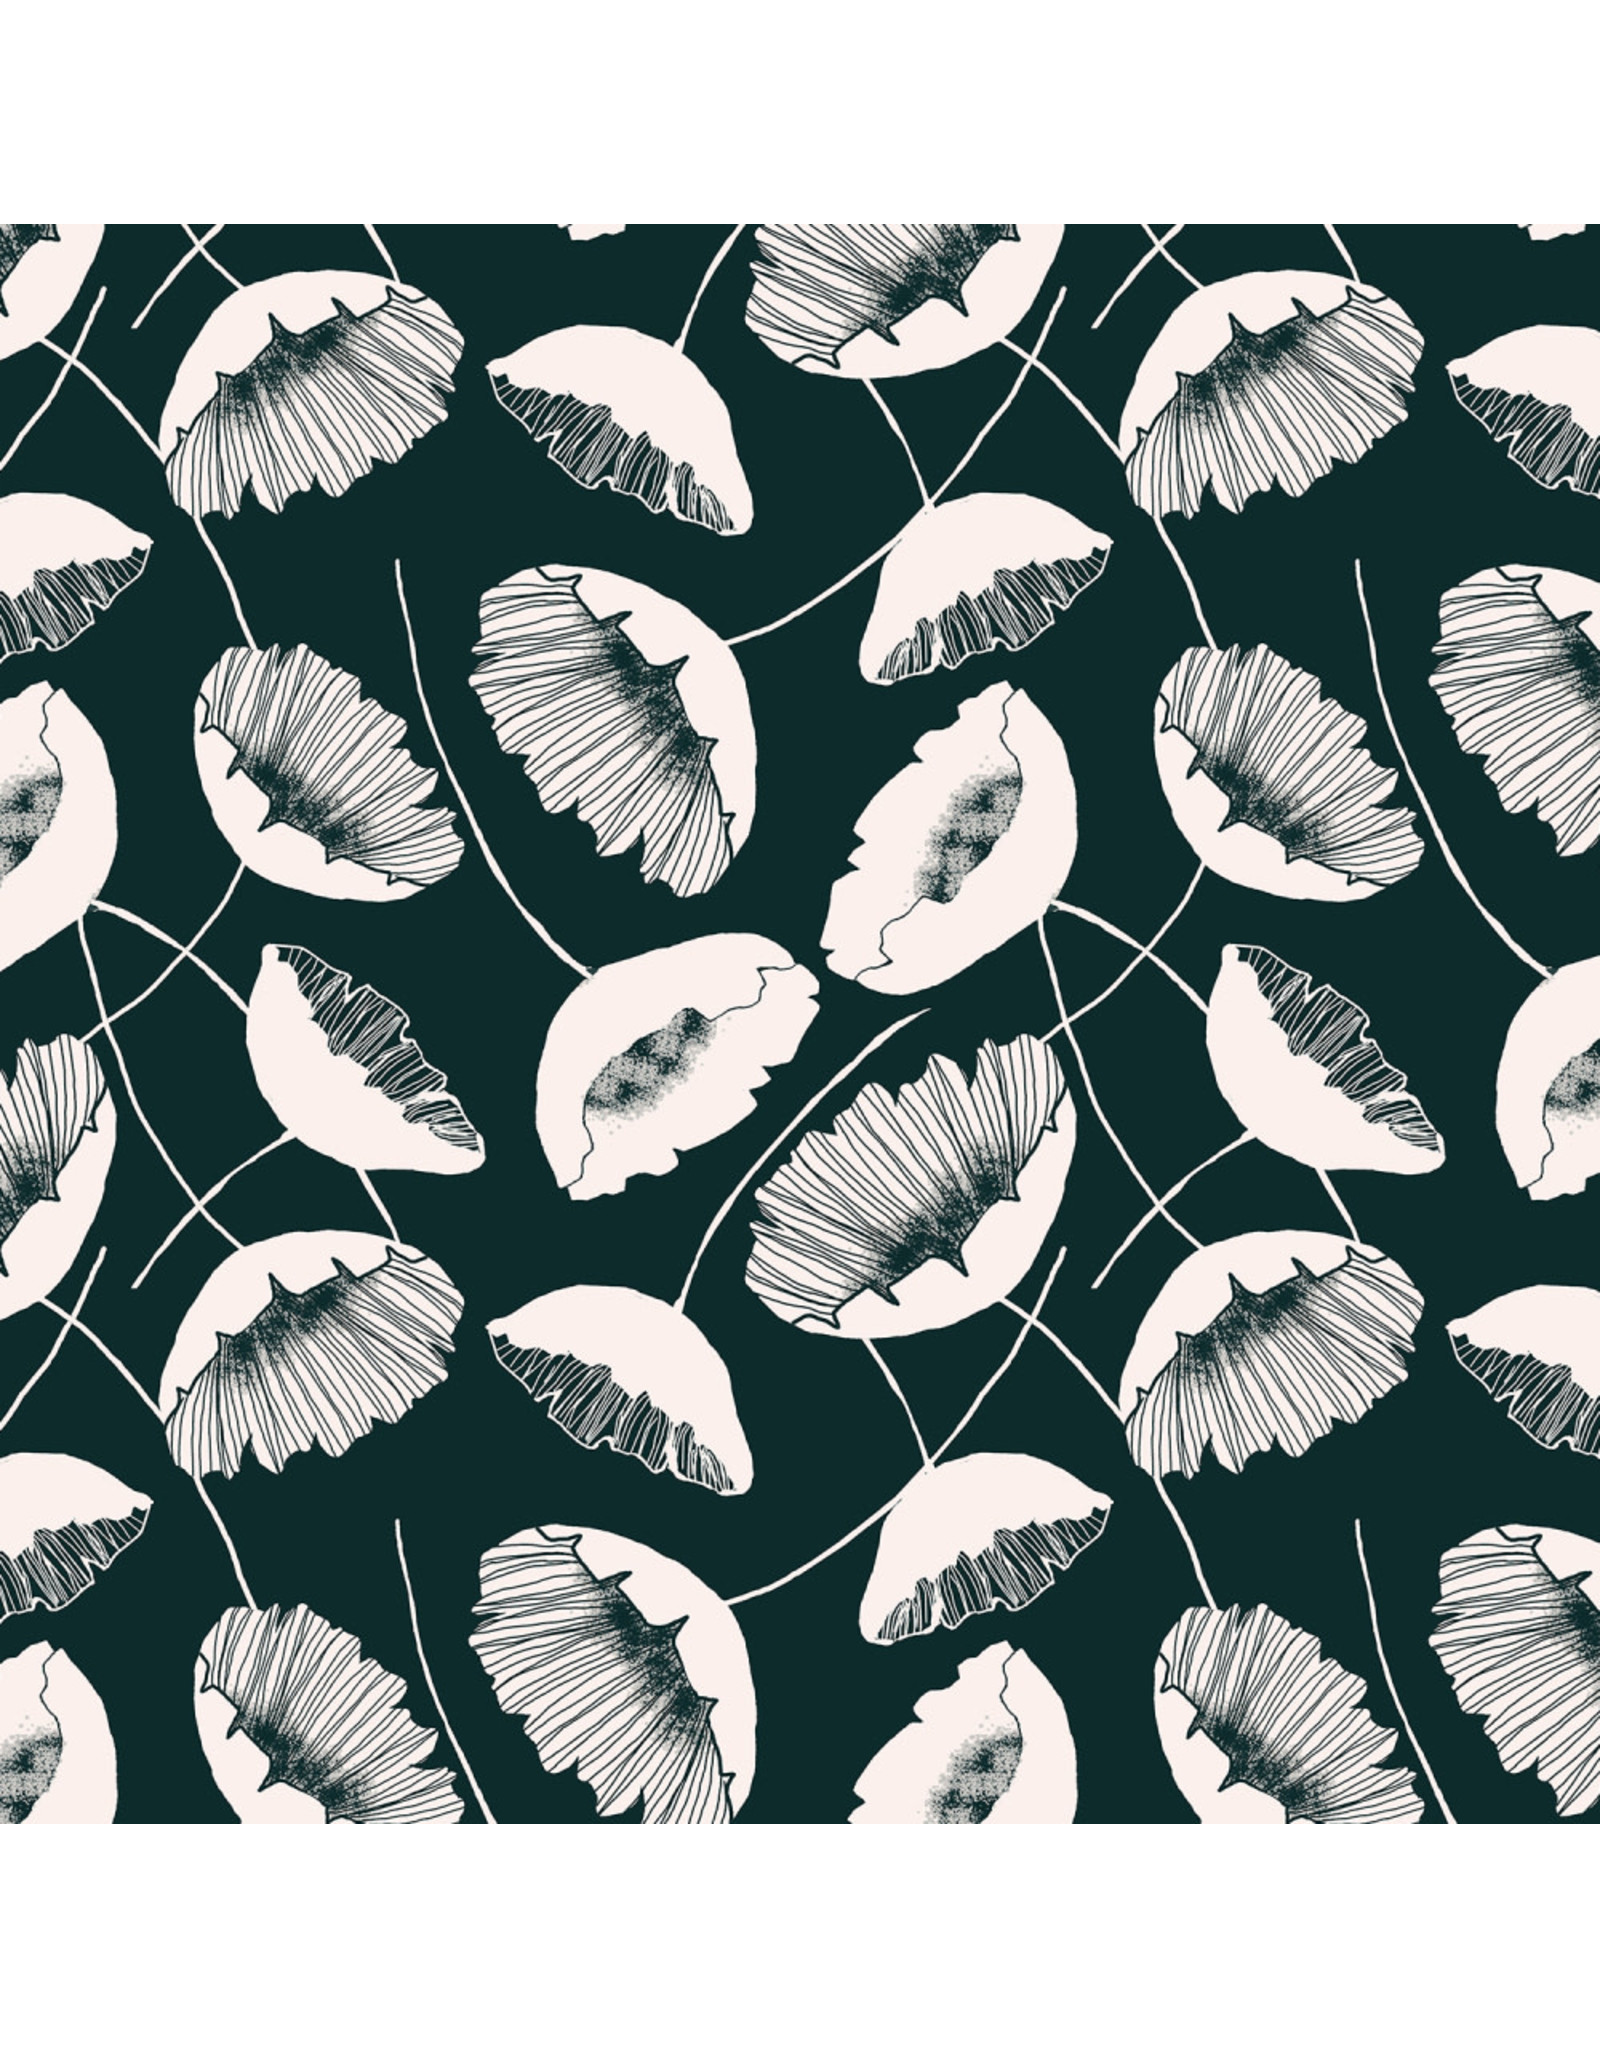 RJR Fabrics Magical Night, Lancaster Fields in Dark Forest, Fabric Half-Yards